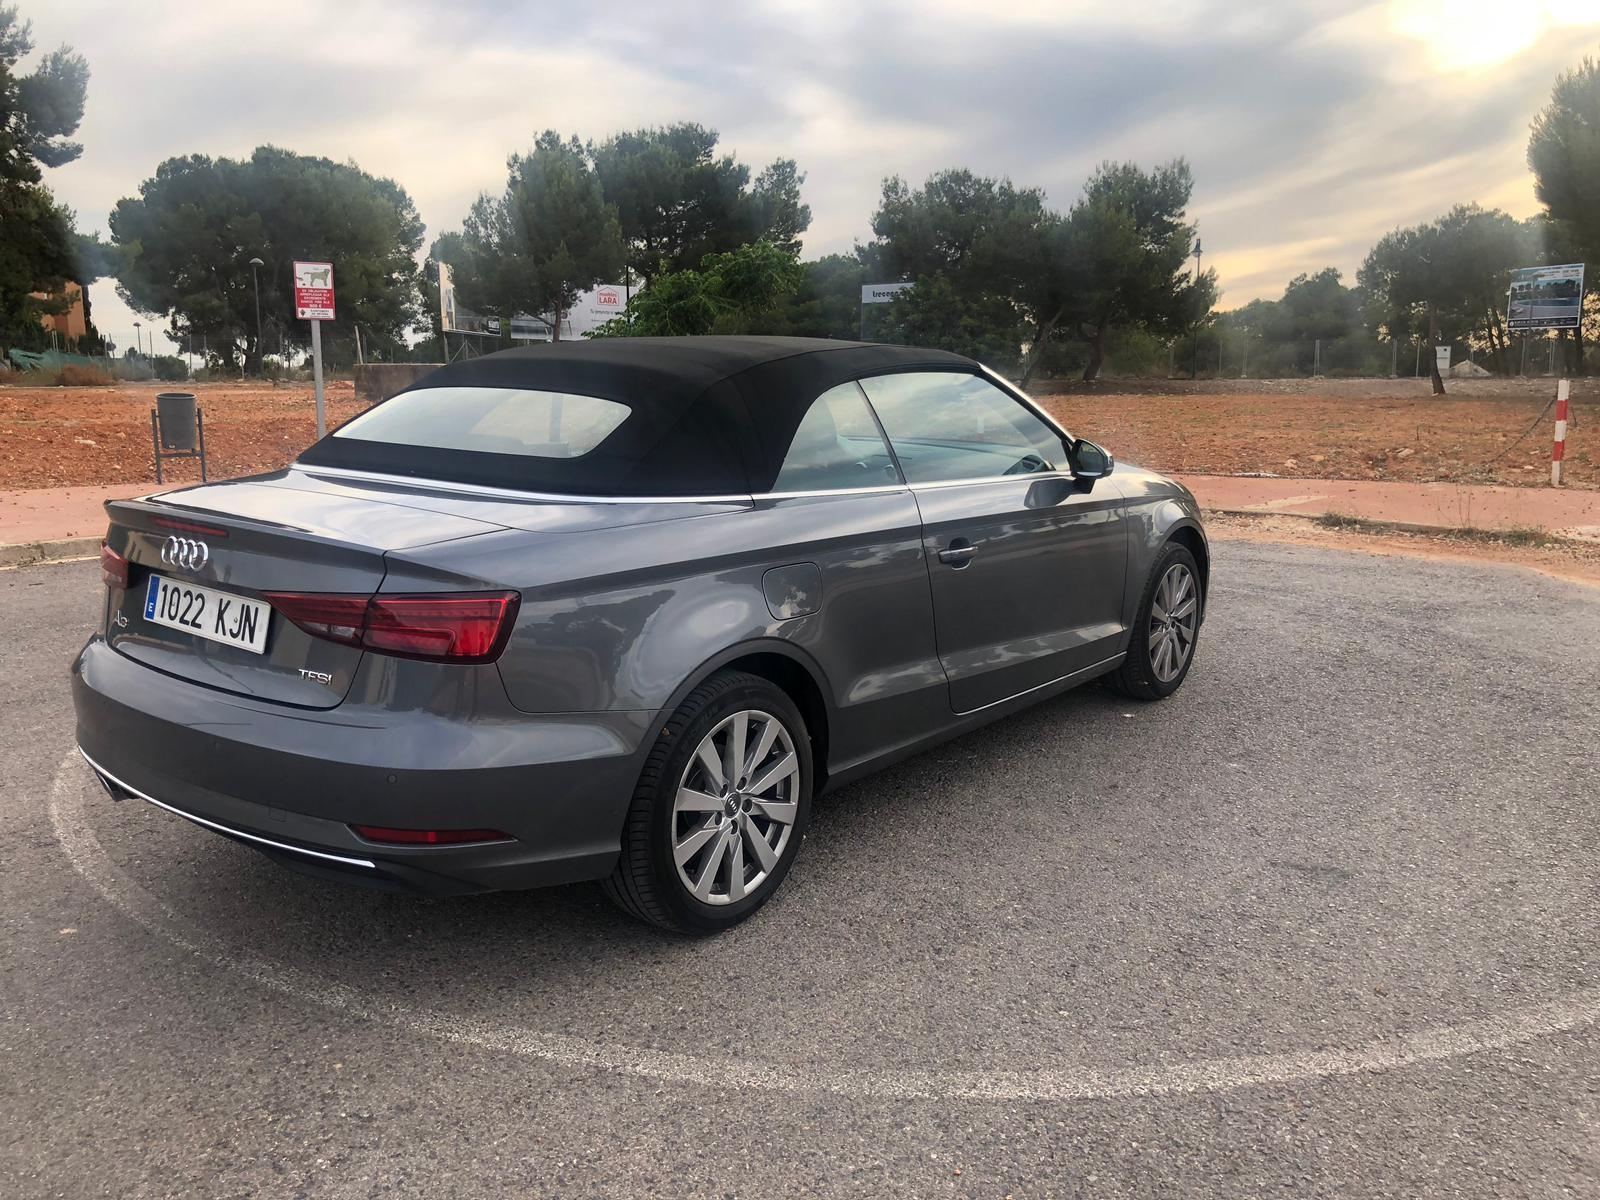 Audi A3 Cabrio Rental Ibiza